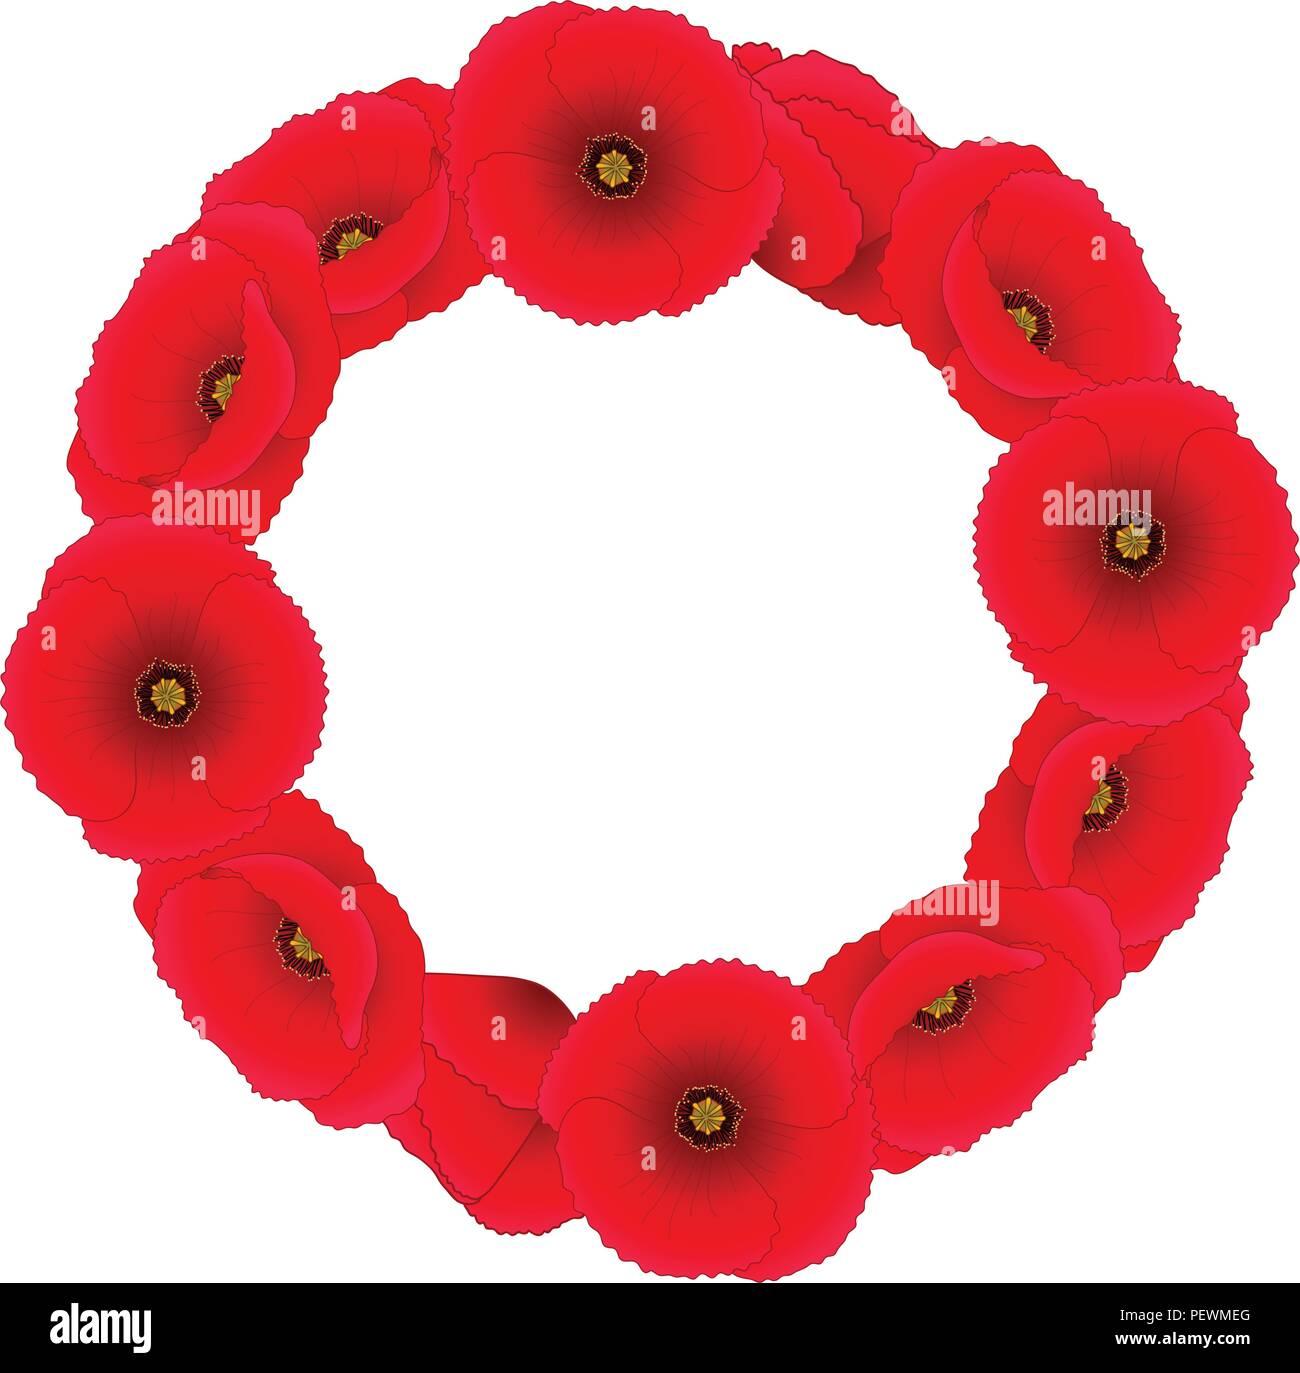 Papaver rhoeas Wreath or common poppy,corn poppy,corn rose,field poppy,Flanders poppy or red poppy. isolated on White Background. Vector Illustration. - Stock Vector